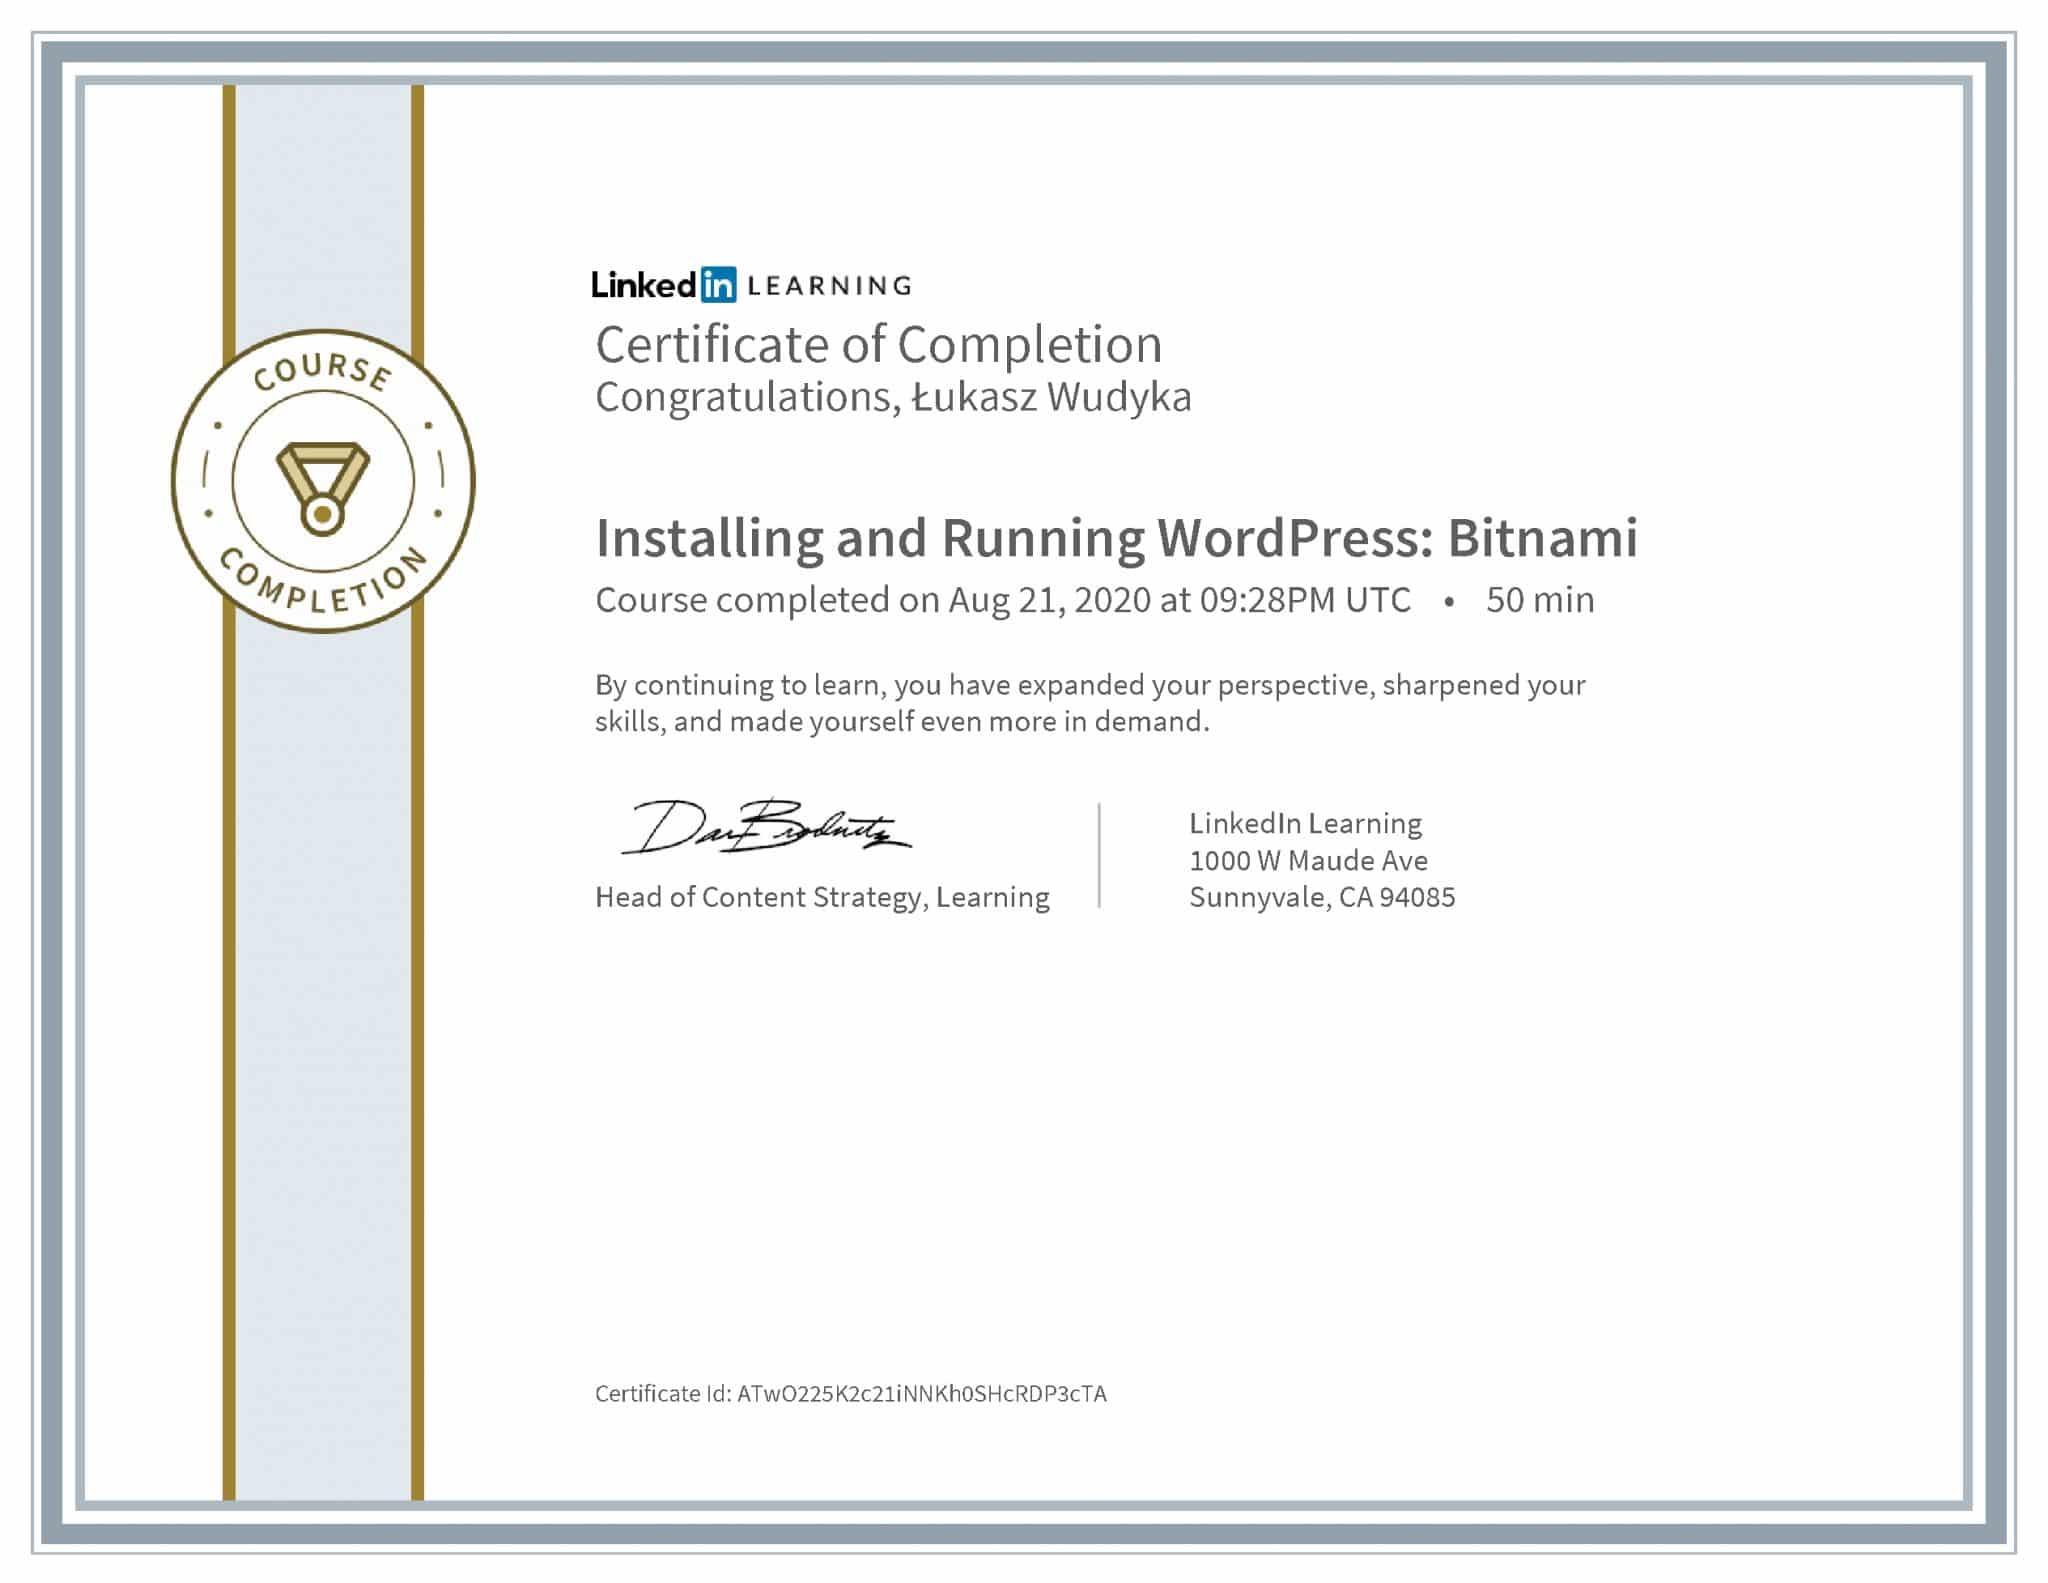 Łukasz Wudyka certyfikat LinkedIn Installing and Running WordPress: Bitnami